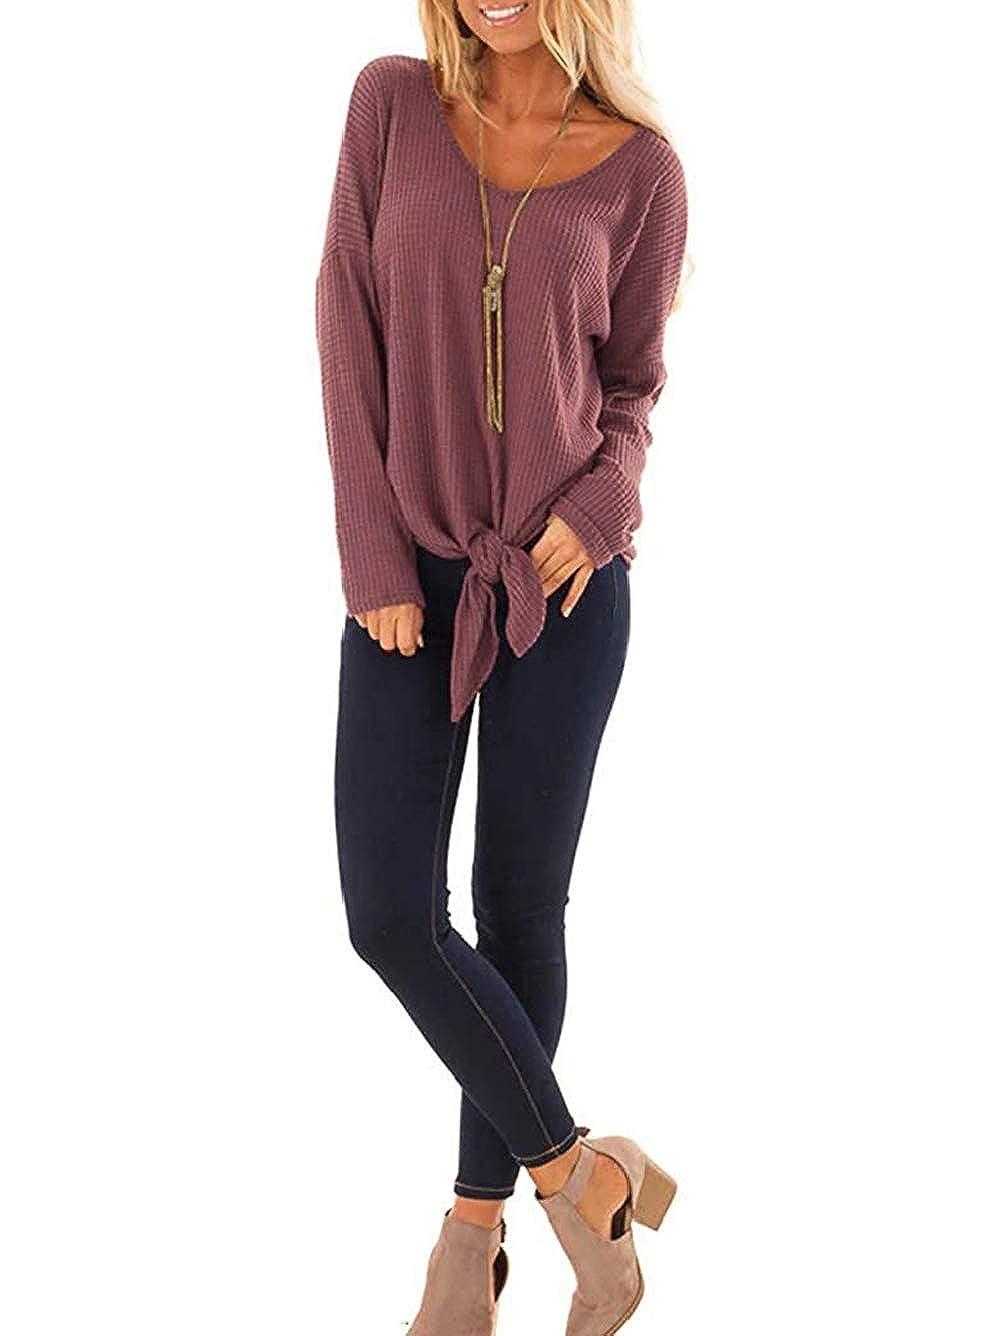 Cute Loose Tunic Fall Batwing Long Sleeve Blouse Kaei/&Shi Waffle Knit Sweater for Women Knot Tie Front Top